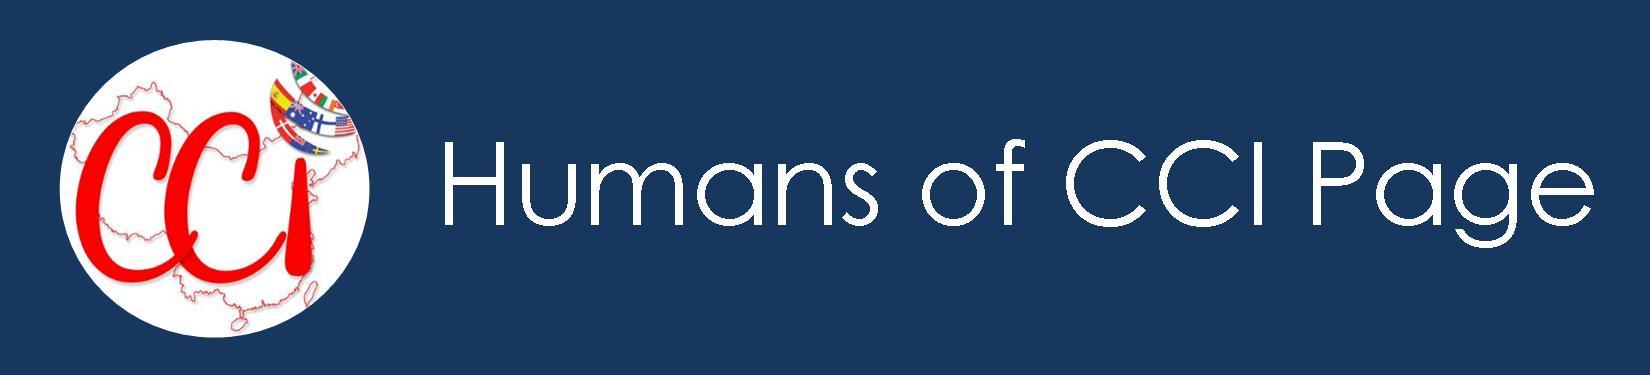 Humans of CCI.jpg